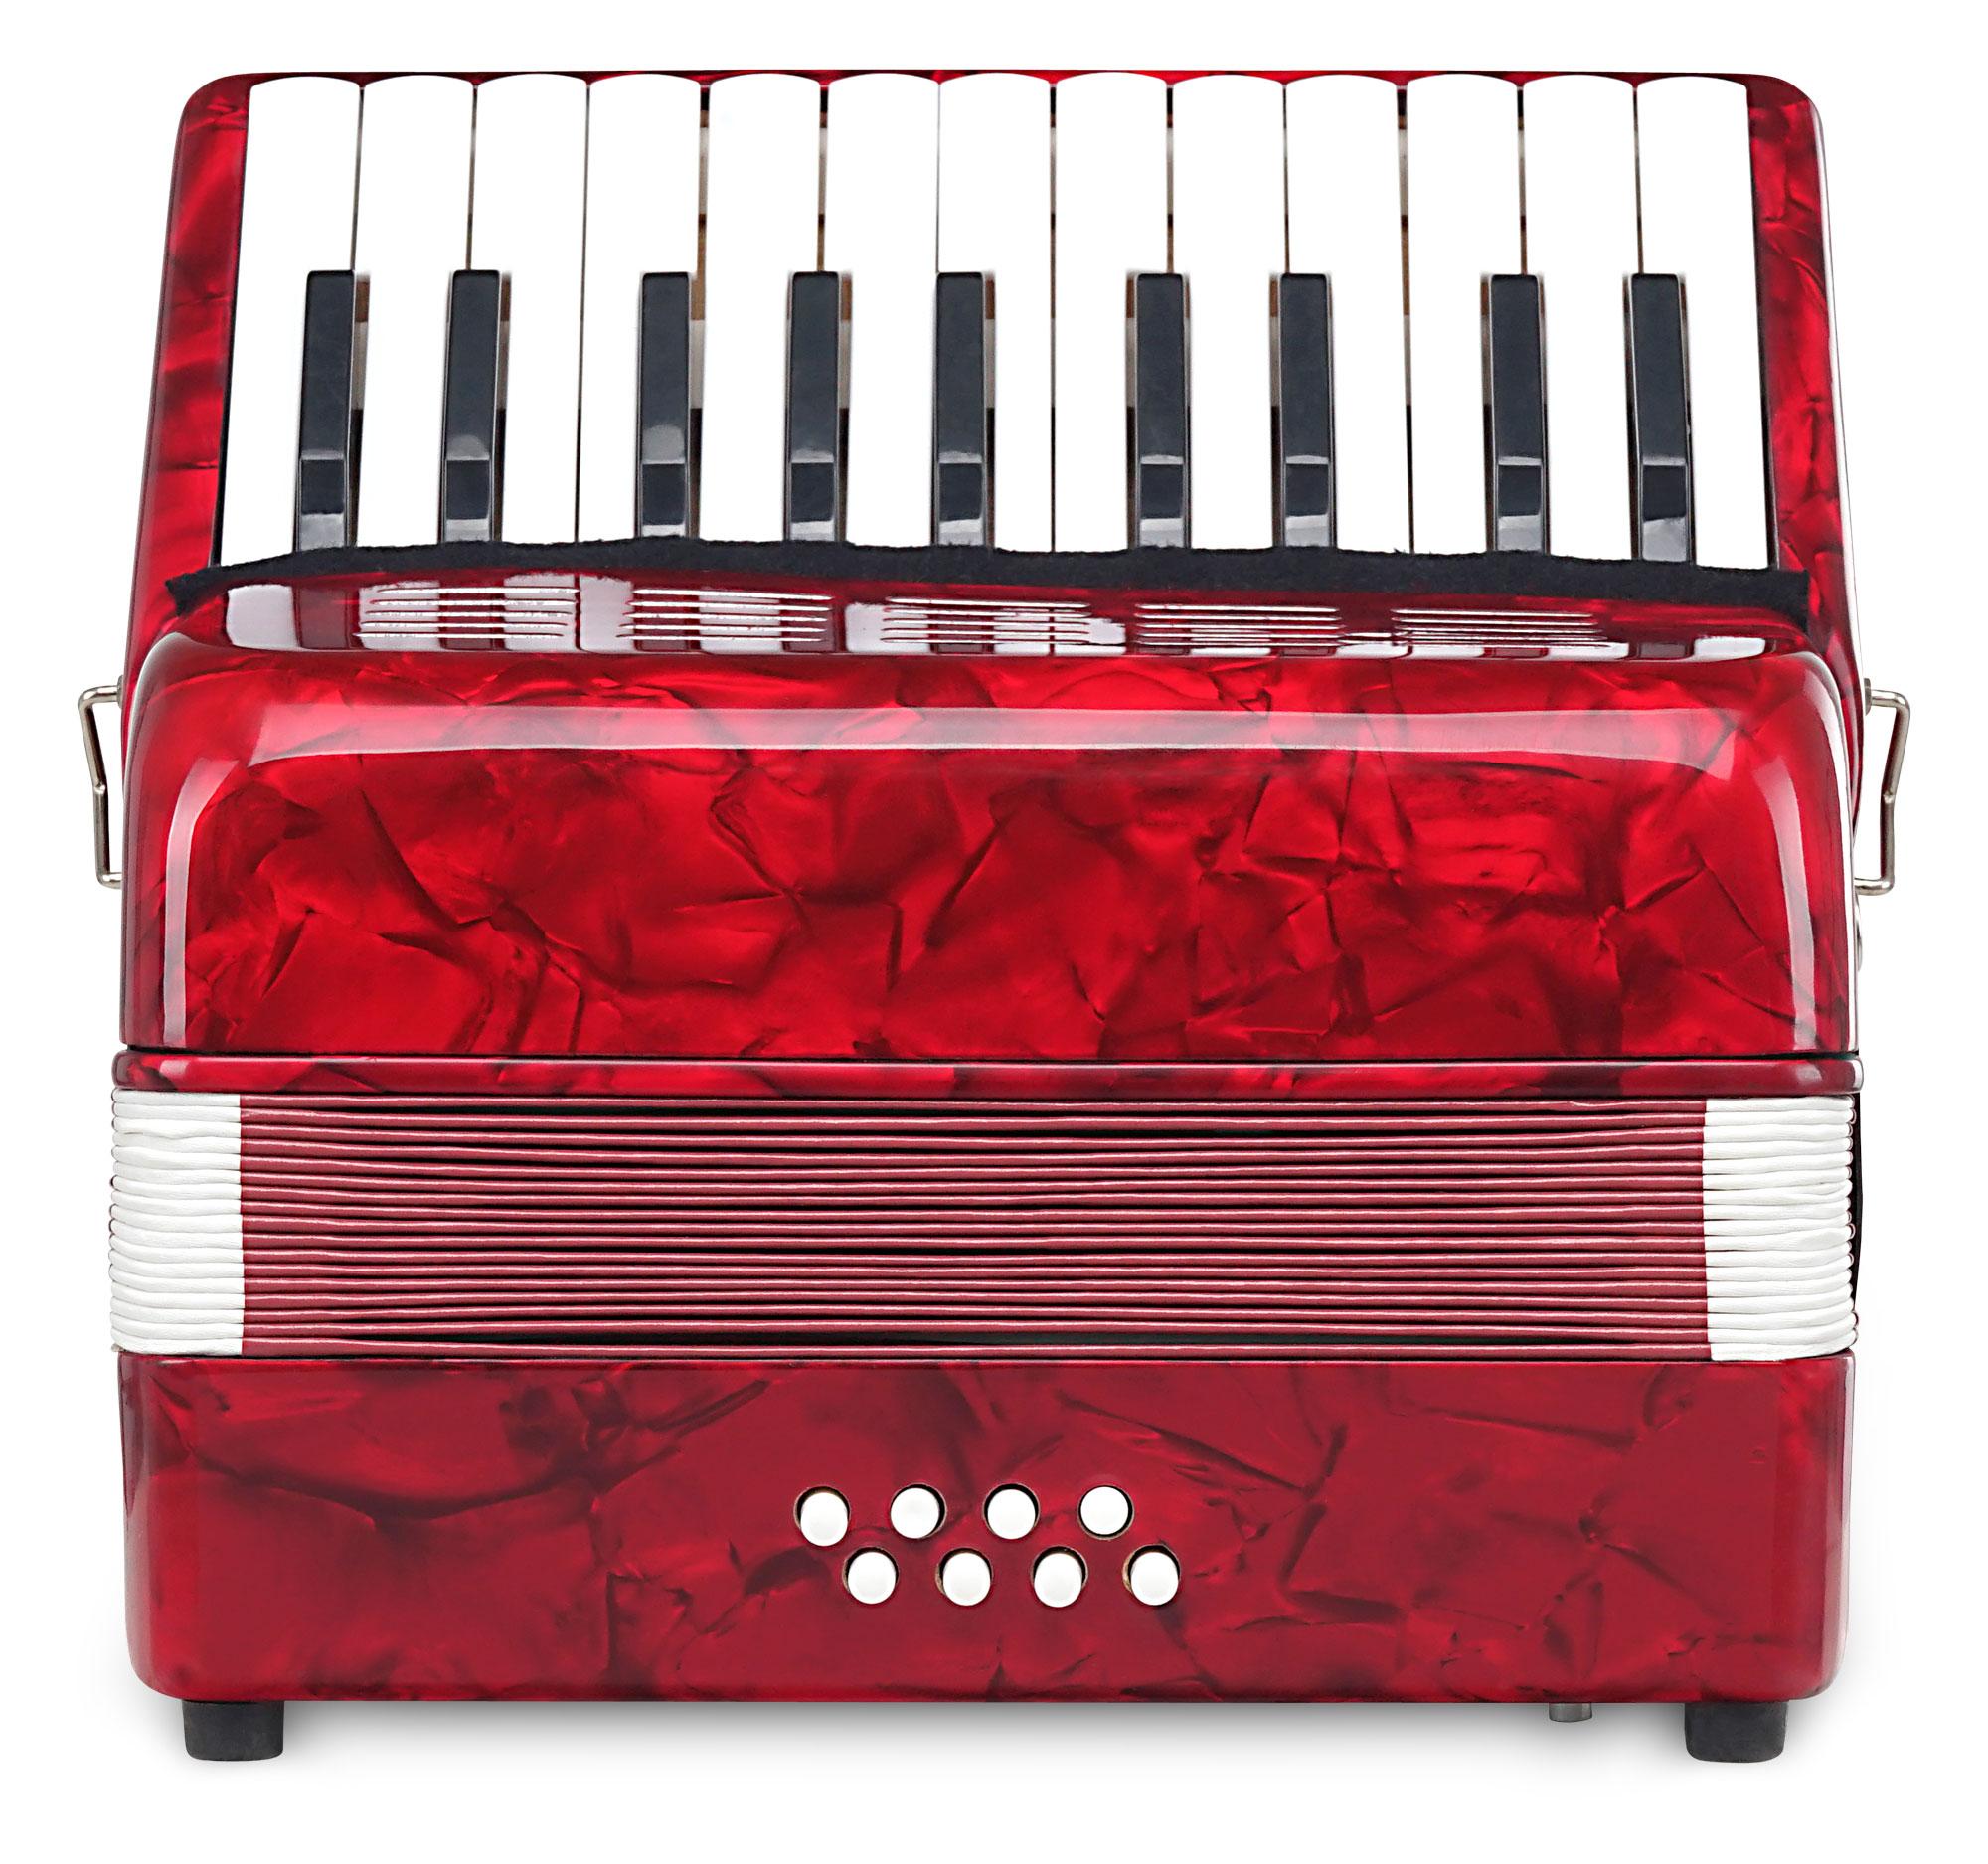 Akkordeons - Classic Cantabile Secondo Kinder Akkordeon 8 Bass rot Retoure (Zustand sehr gut) - Onlineshop Musikhaus Kirstein